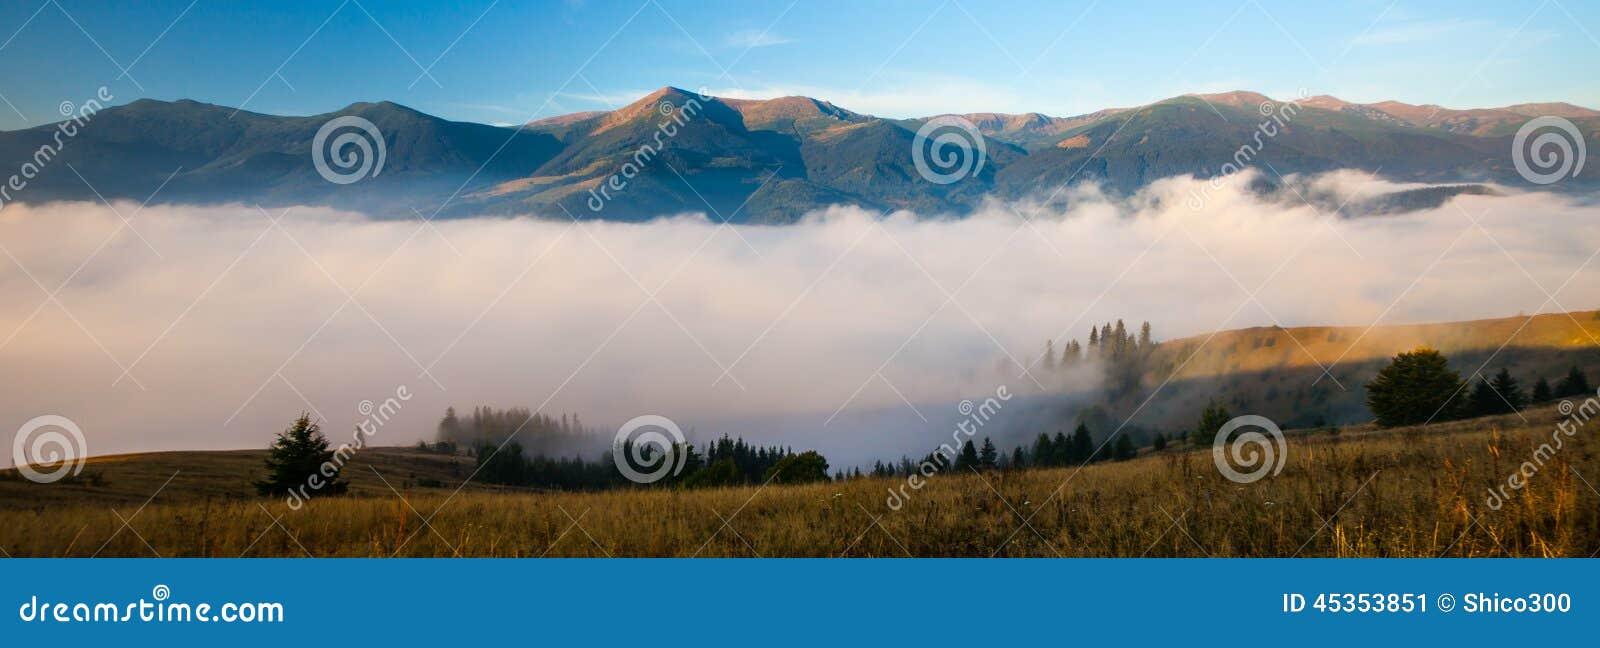 Panorama bleu de montagnes